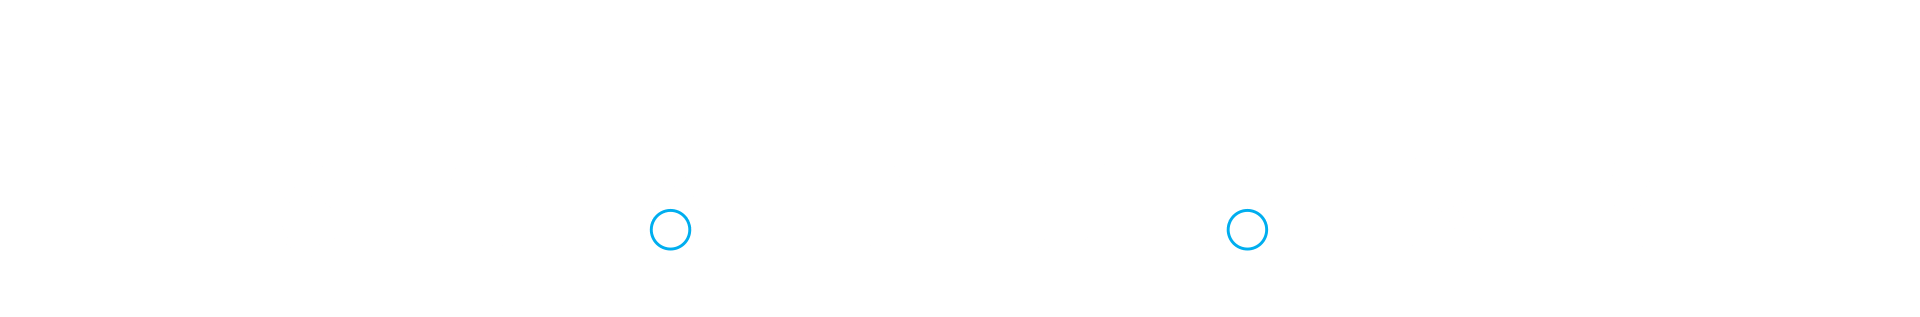 statuary-typeadapted